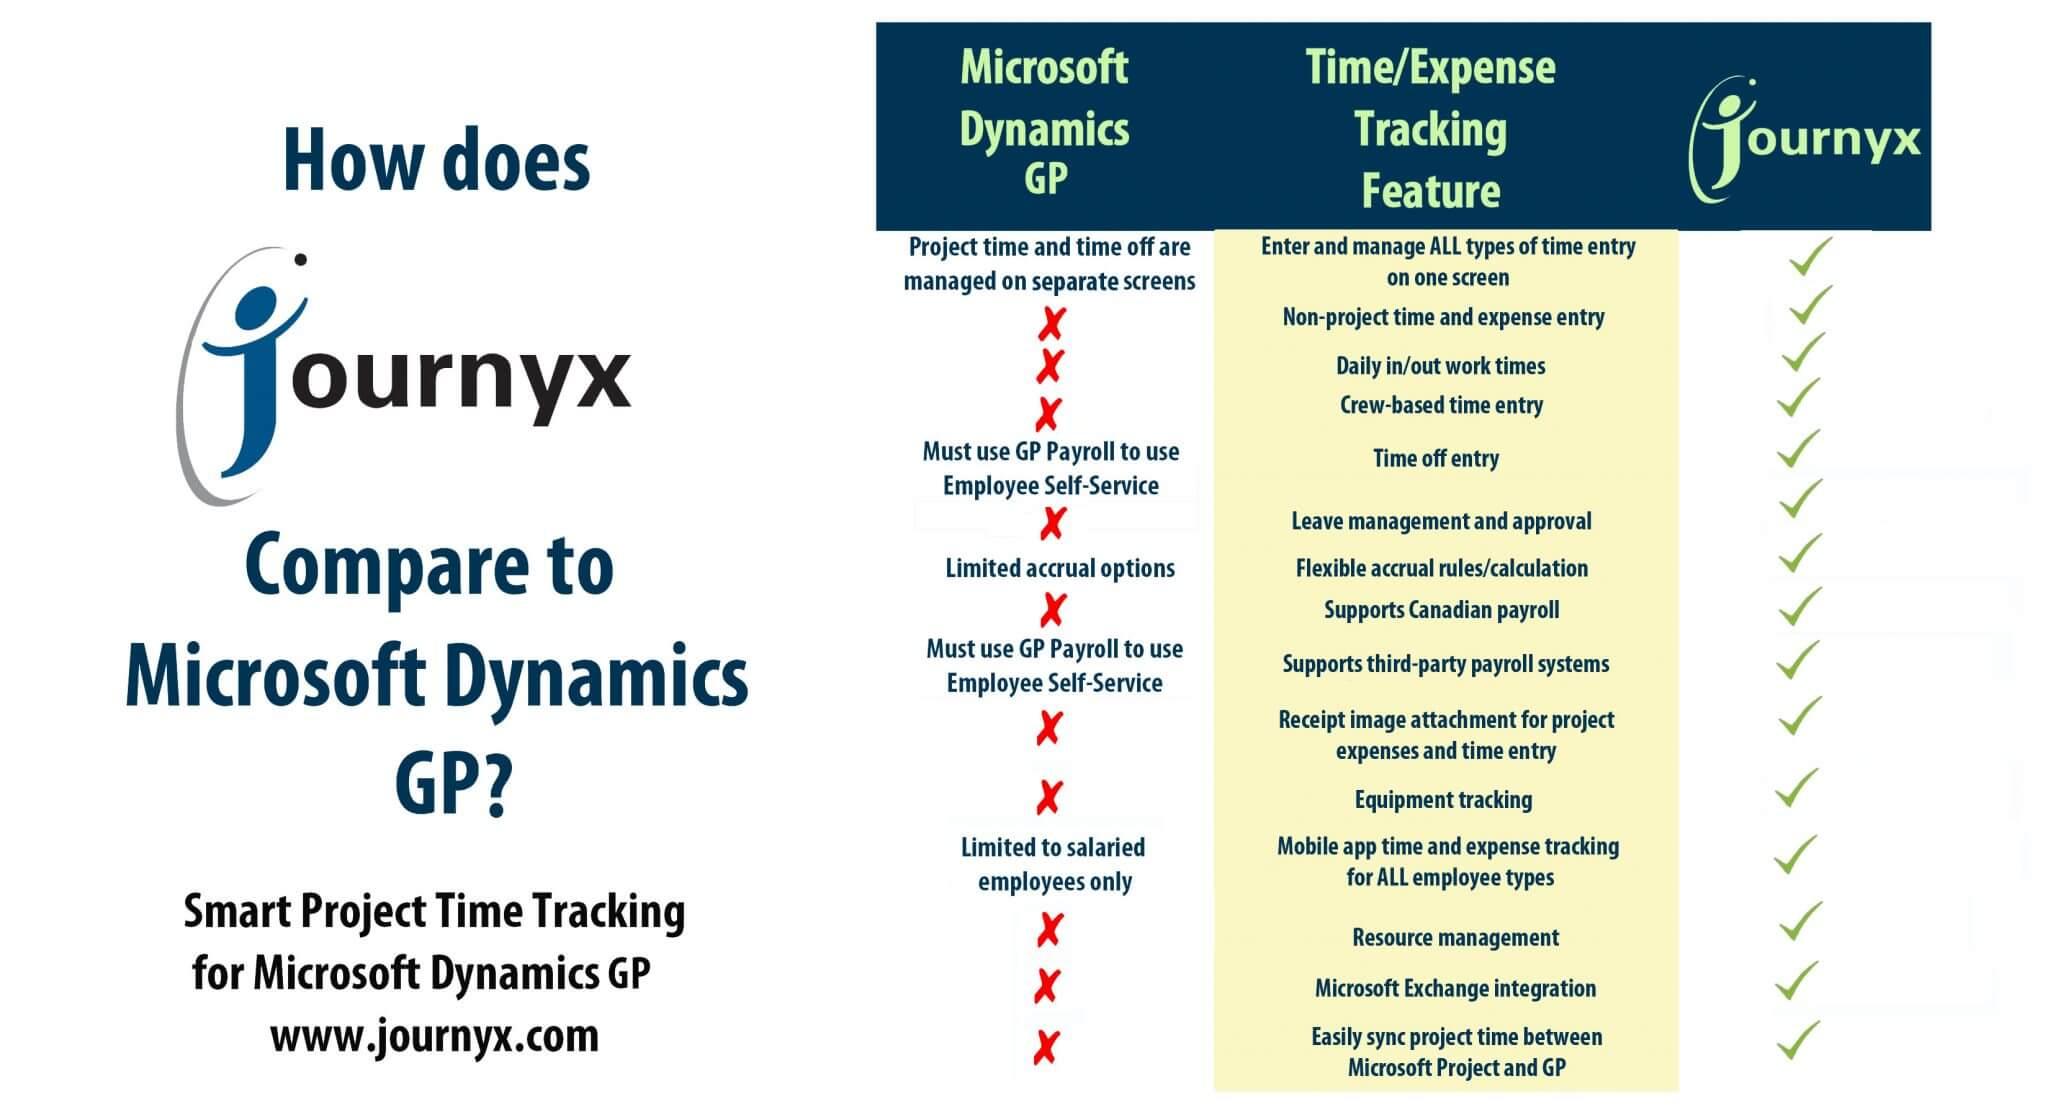 journyx vs dynamics gp comparison chart